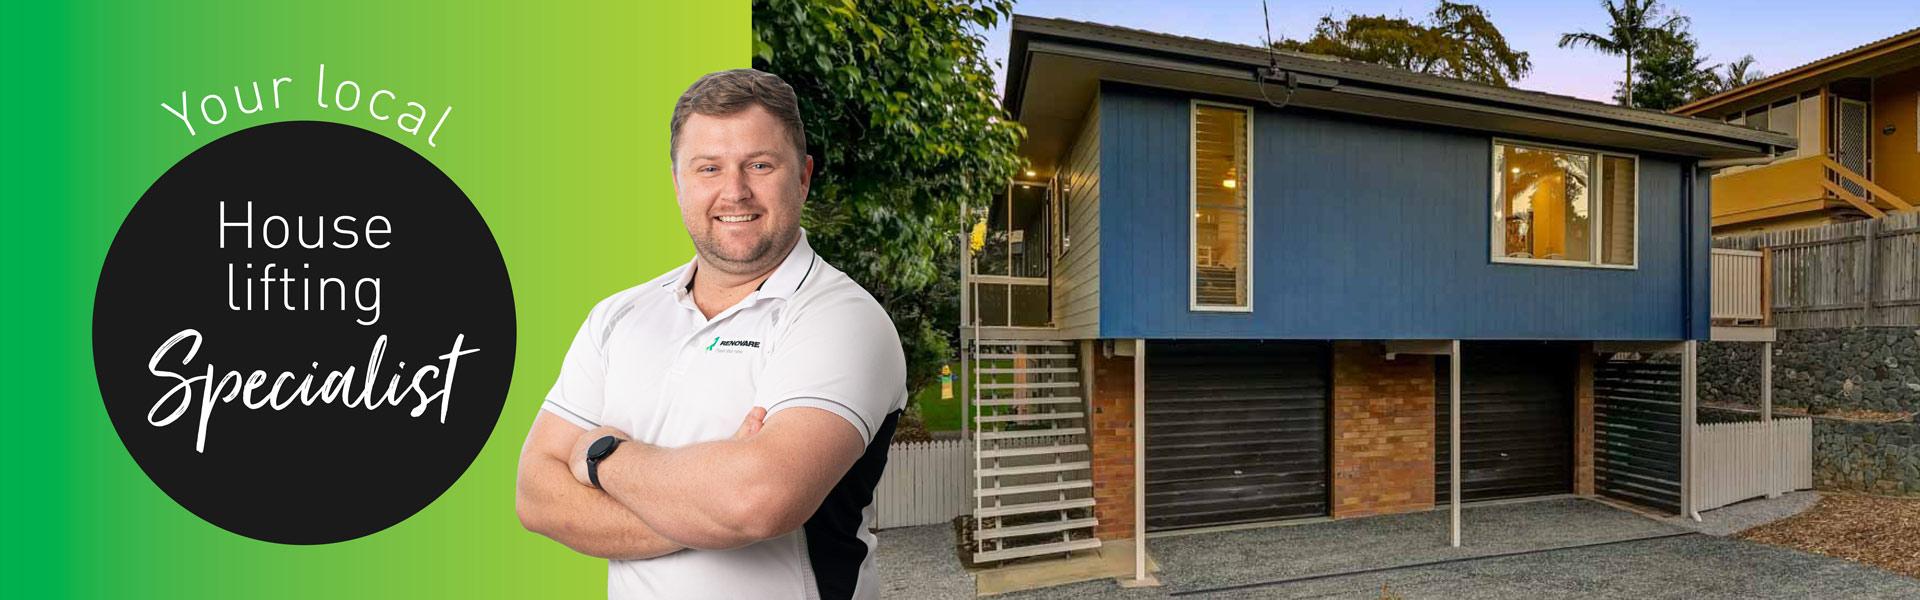 Chermside-House-Lifting-Specialist-Renovare-desktop